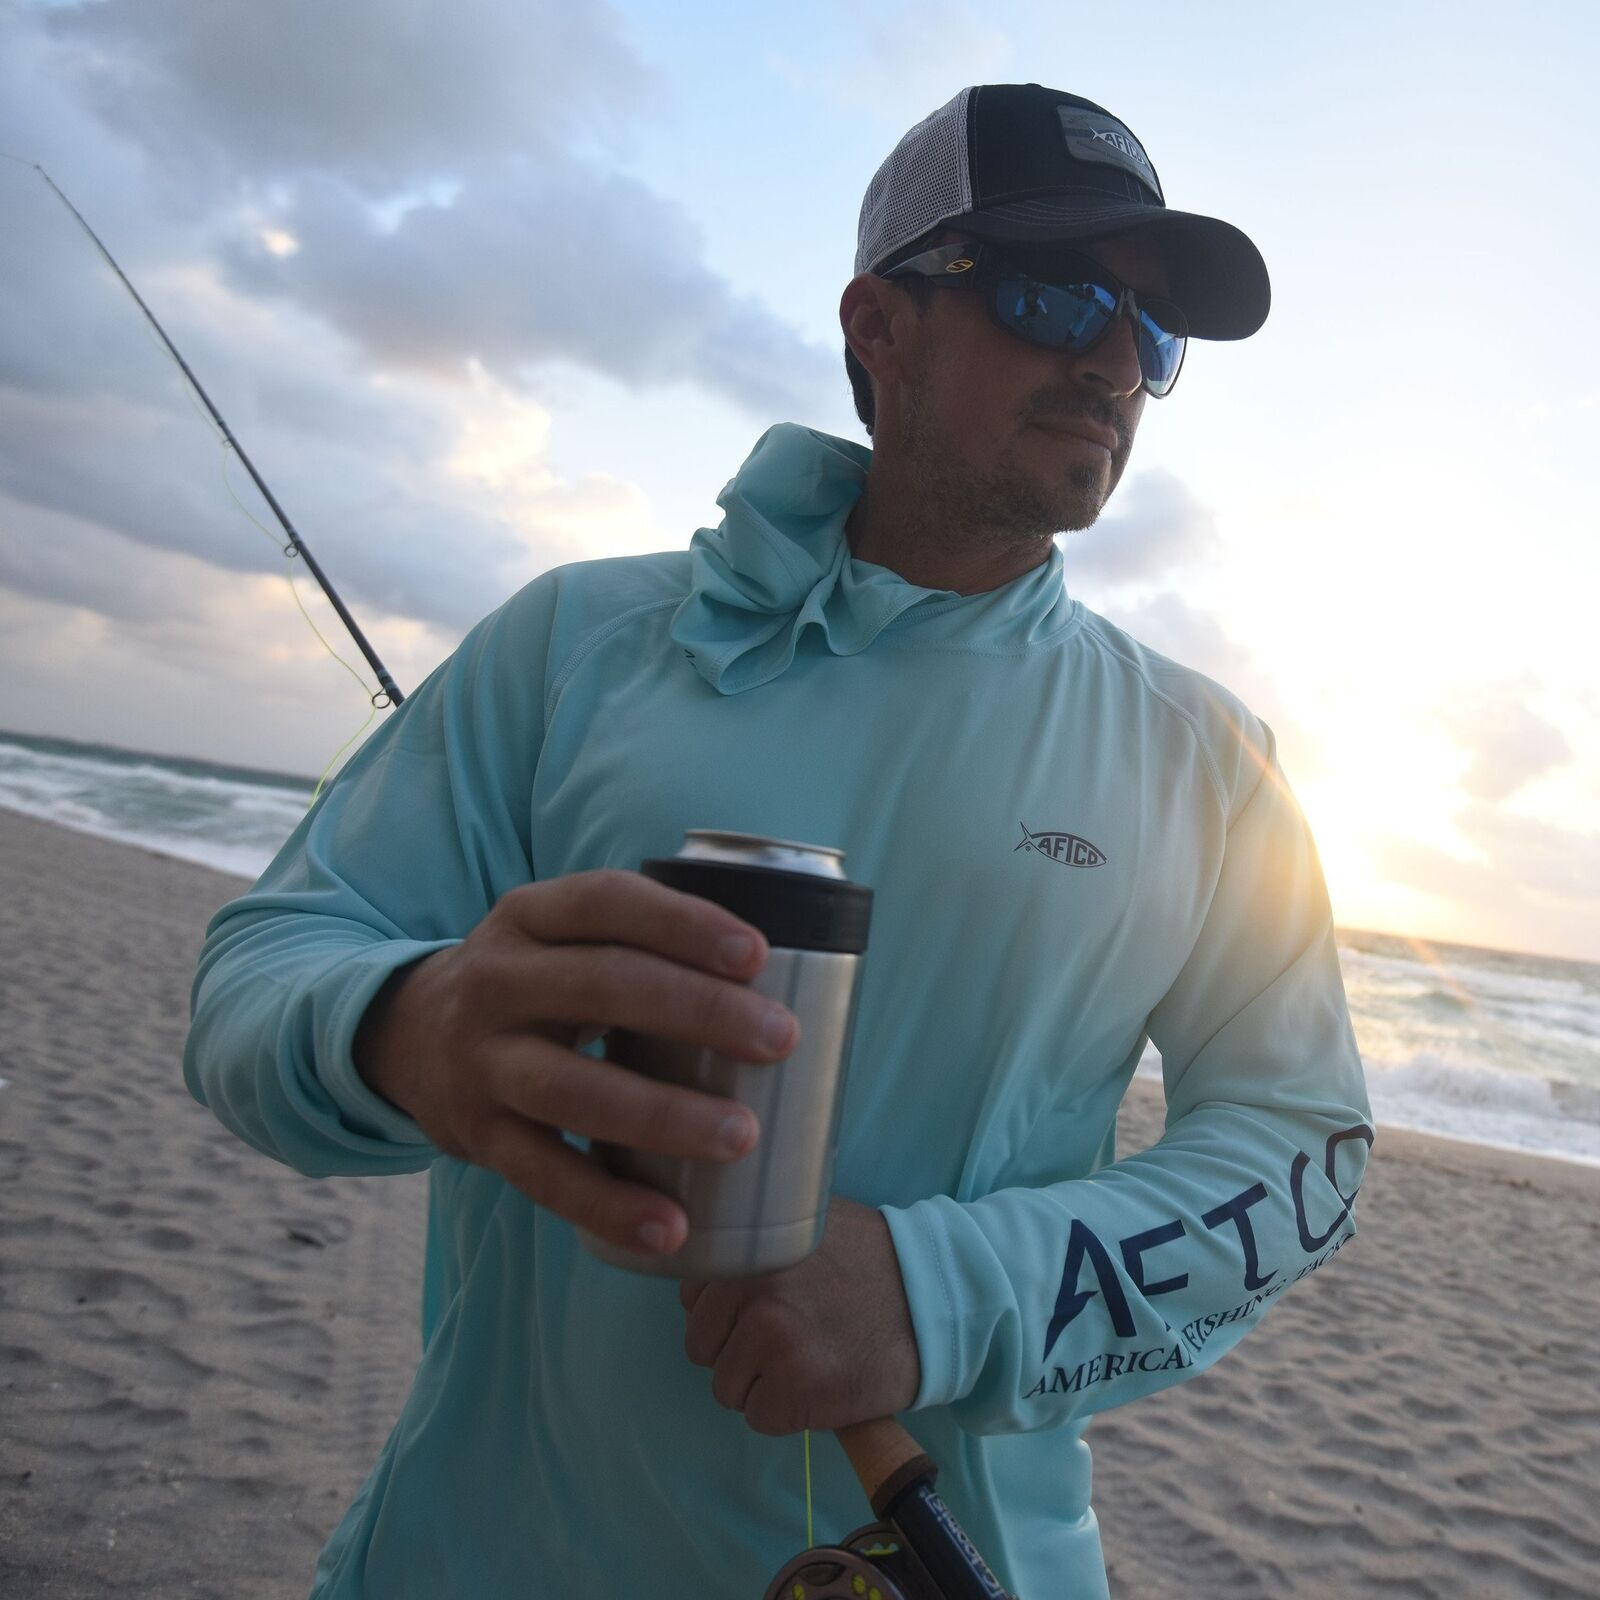 AFTCO Samurai Sun Predection Hoodie-Fishing Shirt-UPF 50-Mint Green -Free Ship